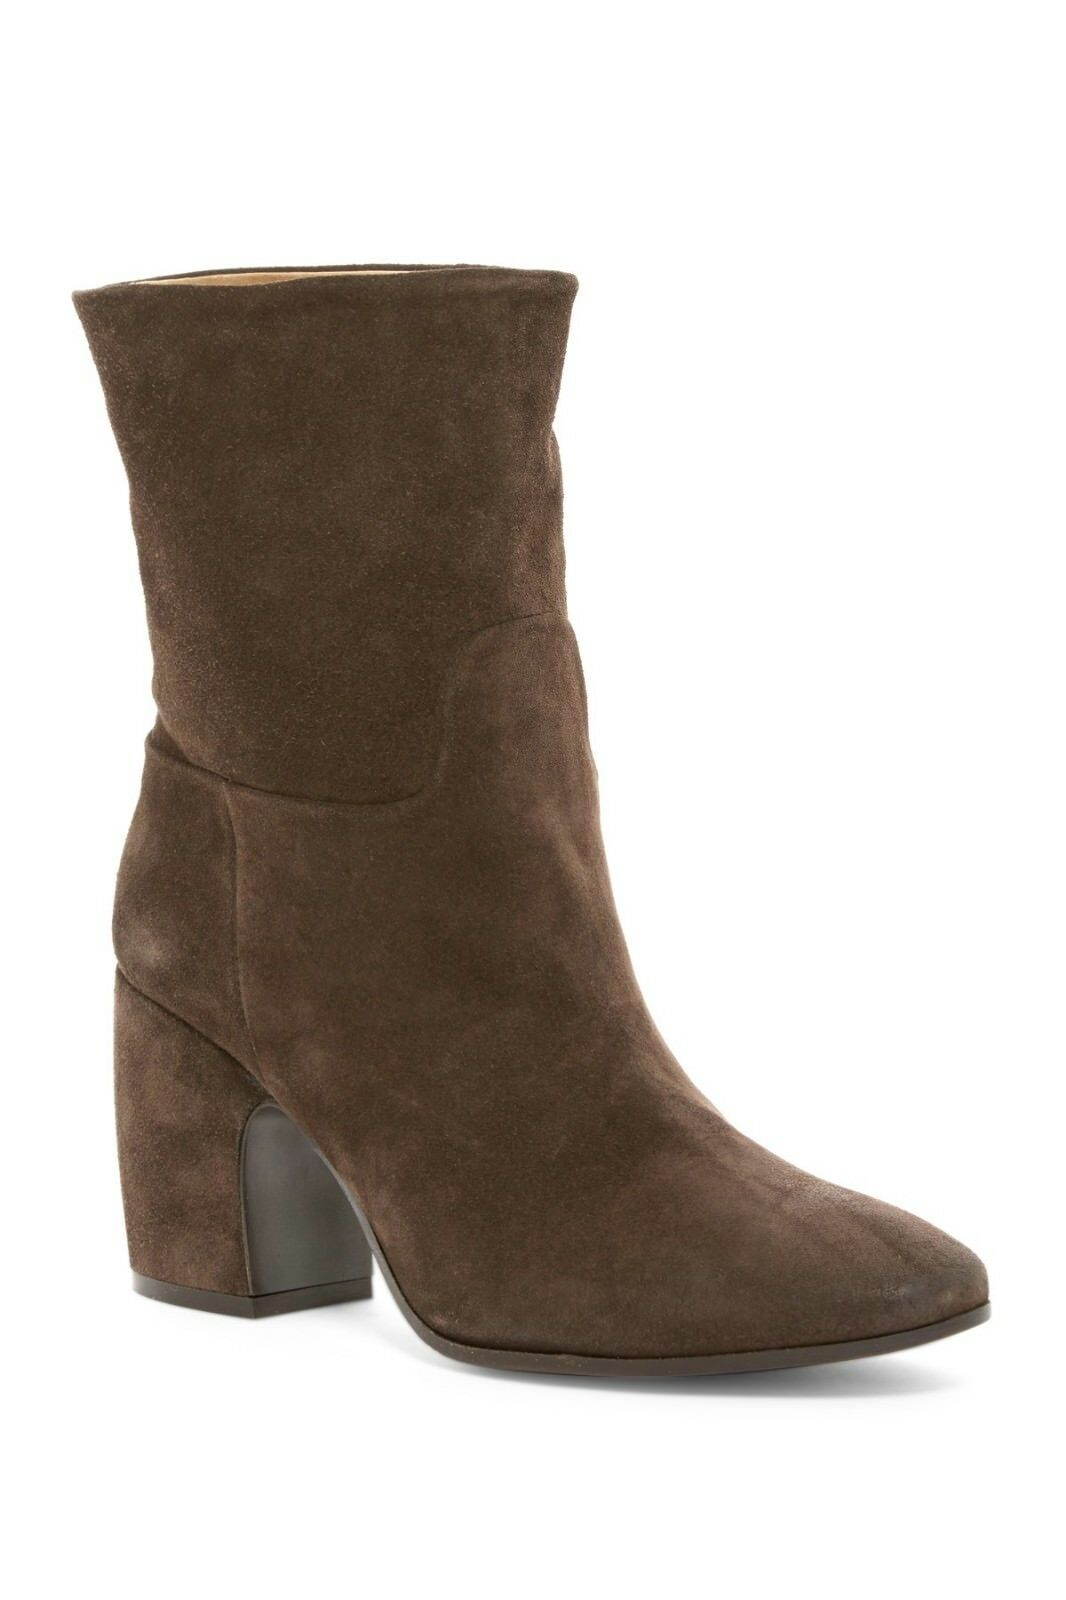 NEW Alberto Fermani Coletta Boot, Brown Suede, Women Size 37.5 (7.5 US), $465